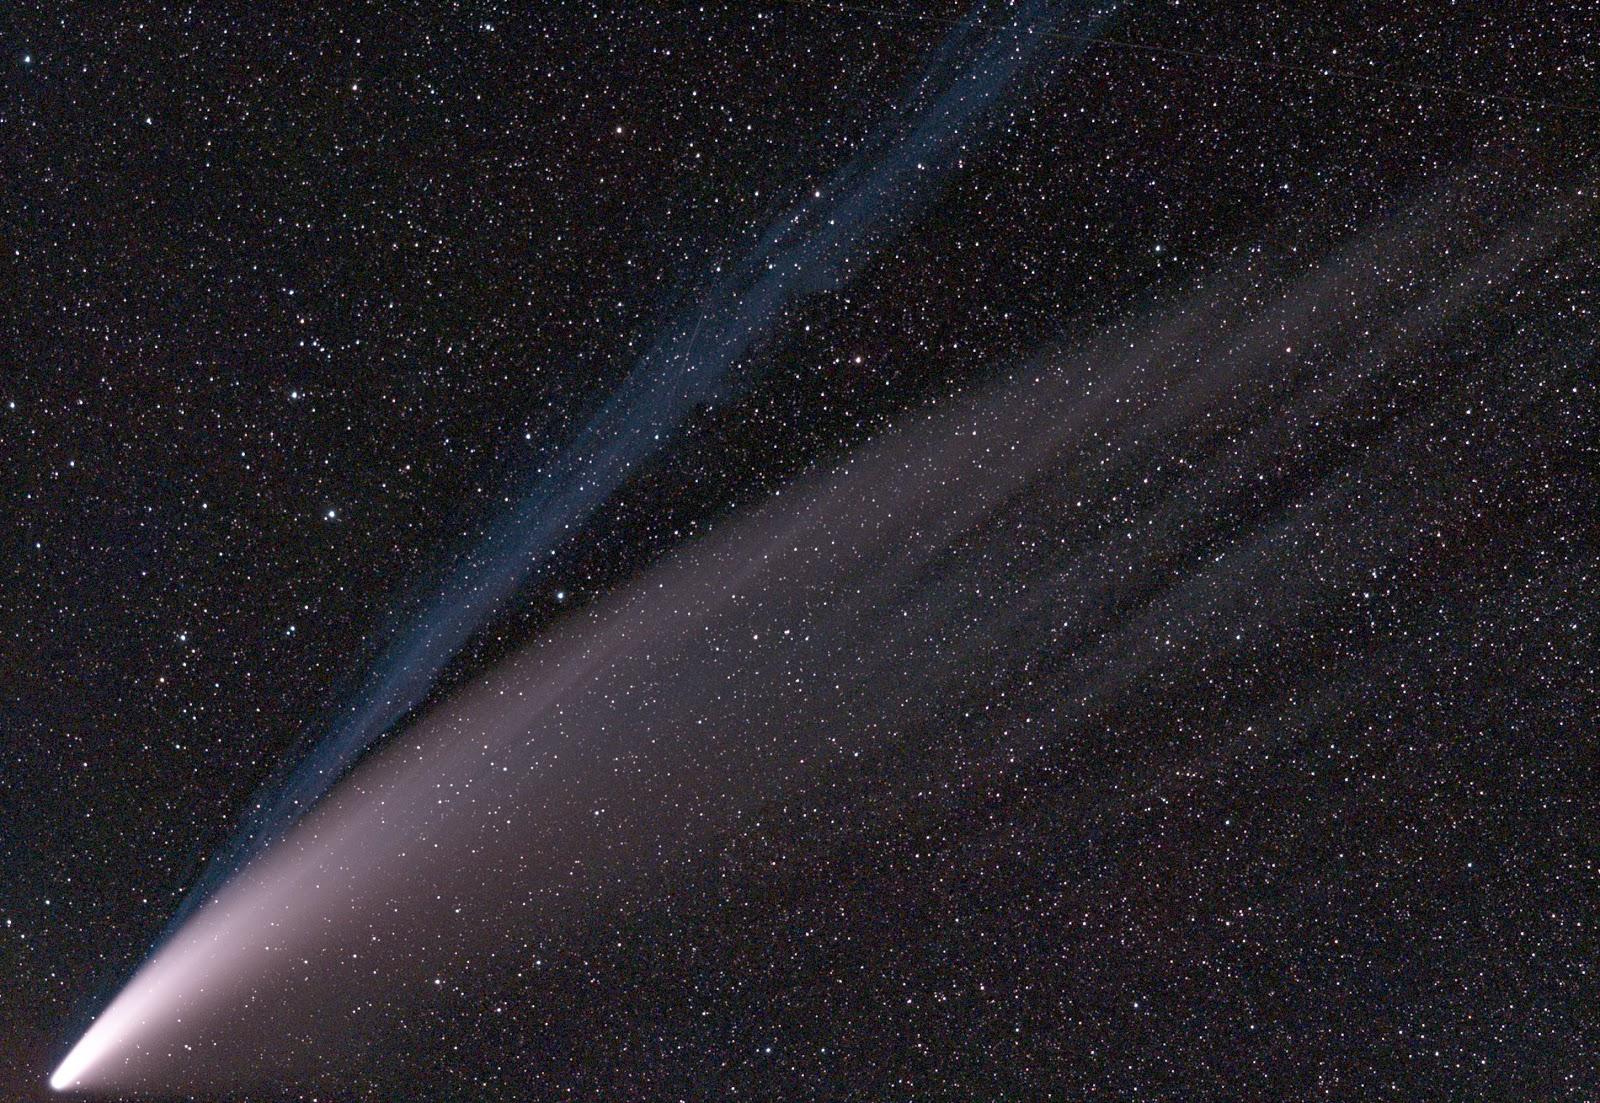 https://upload.wikimedia.org/wikipedia/commons/b/ba/Comet_2020_F3_%28NEOWISE%29_on_Jul_14_2020_aligned_to_stars.jpg